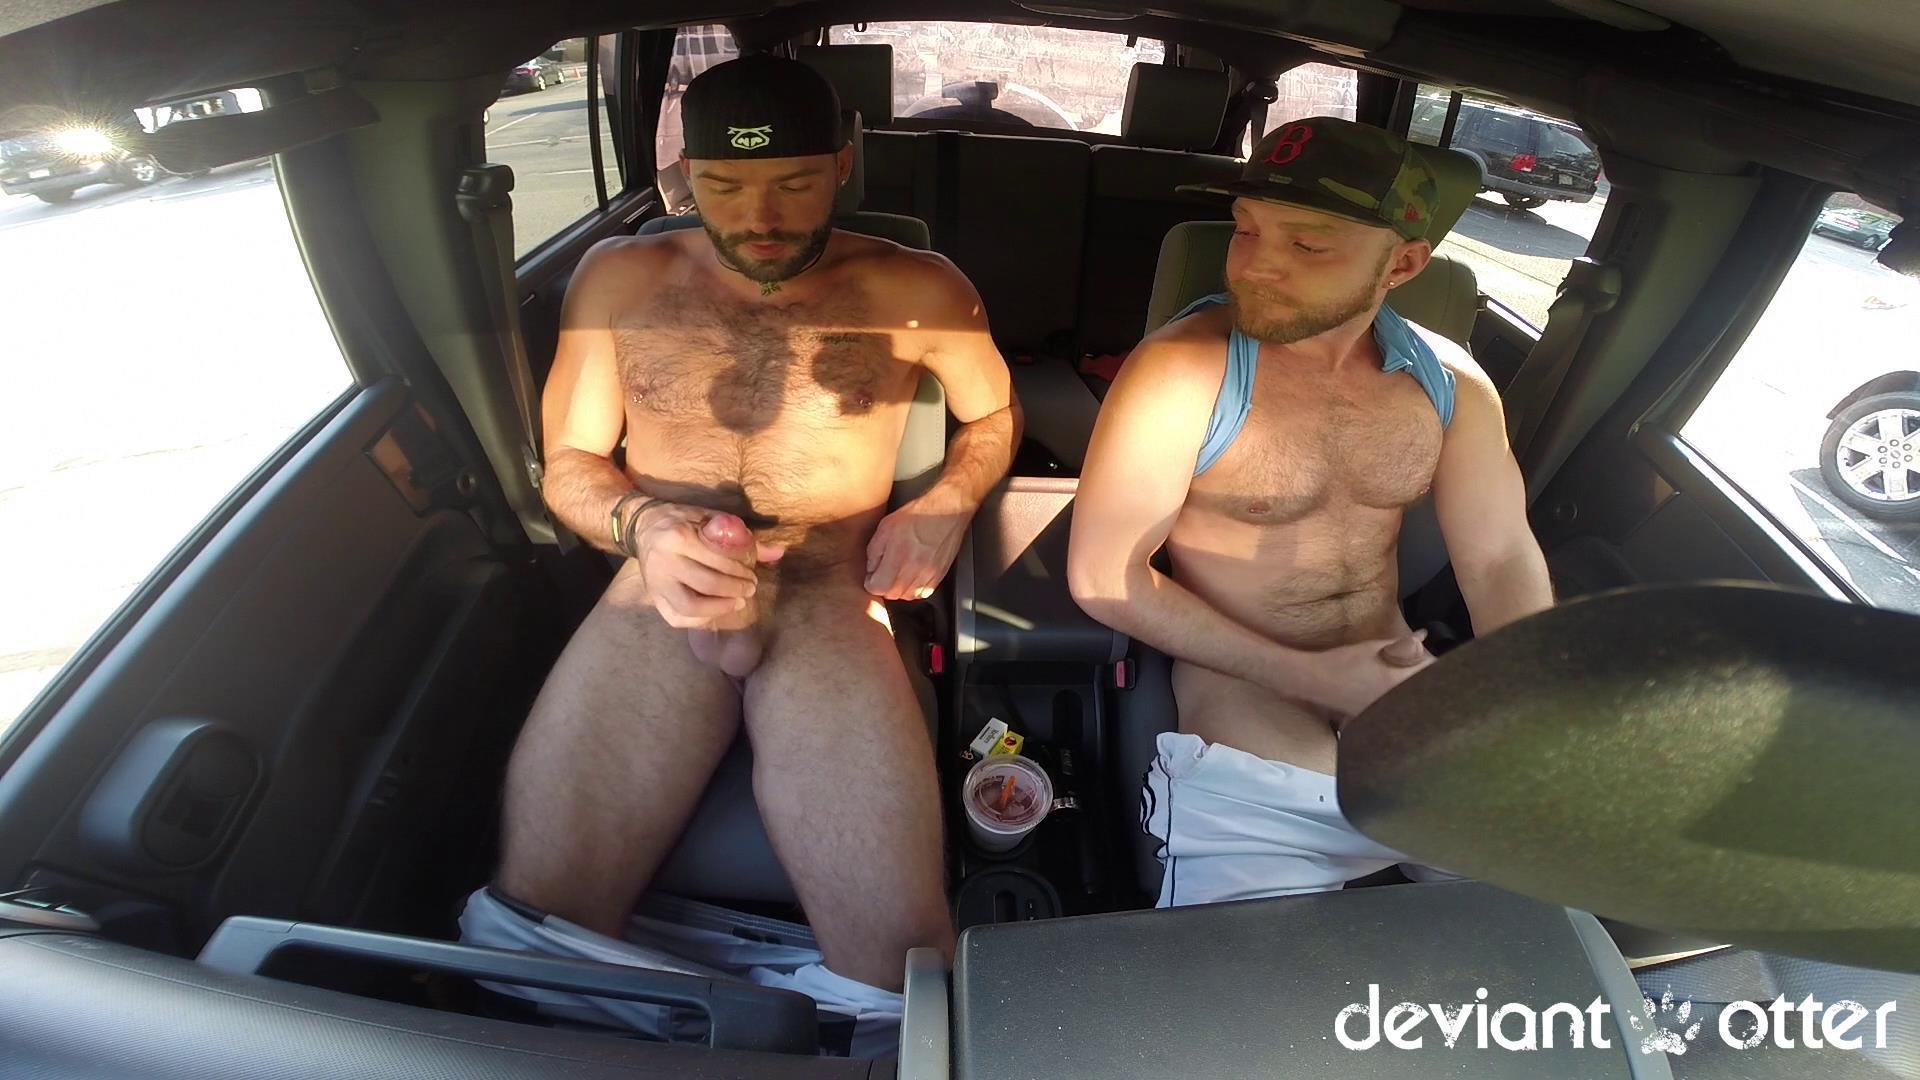 Deviant Otter Xavier Sucking Cock In Public Hairy Guys Amateur Gay Porn 11